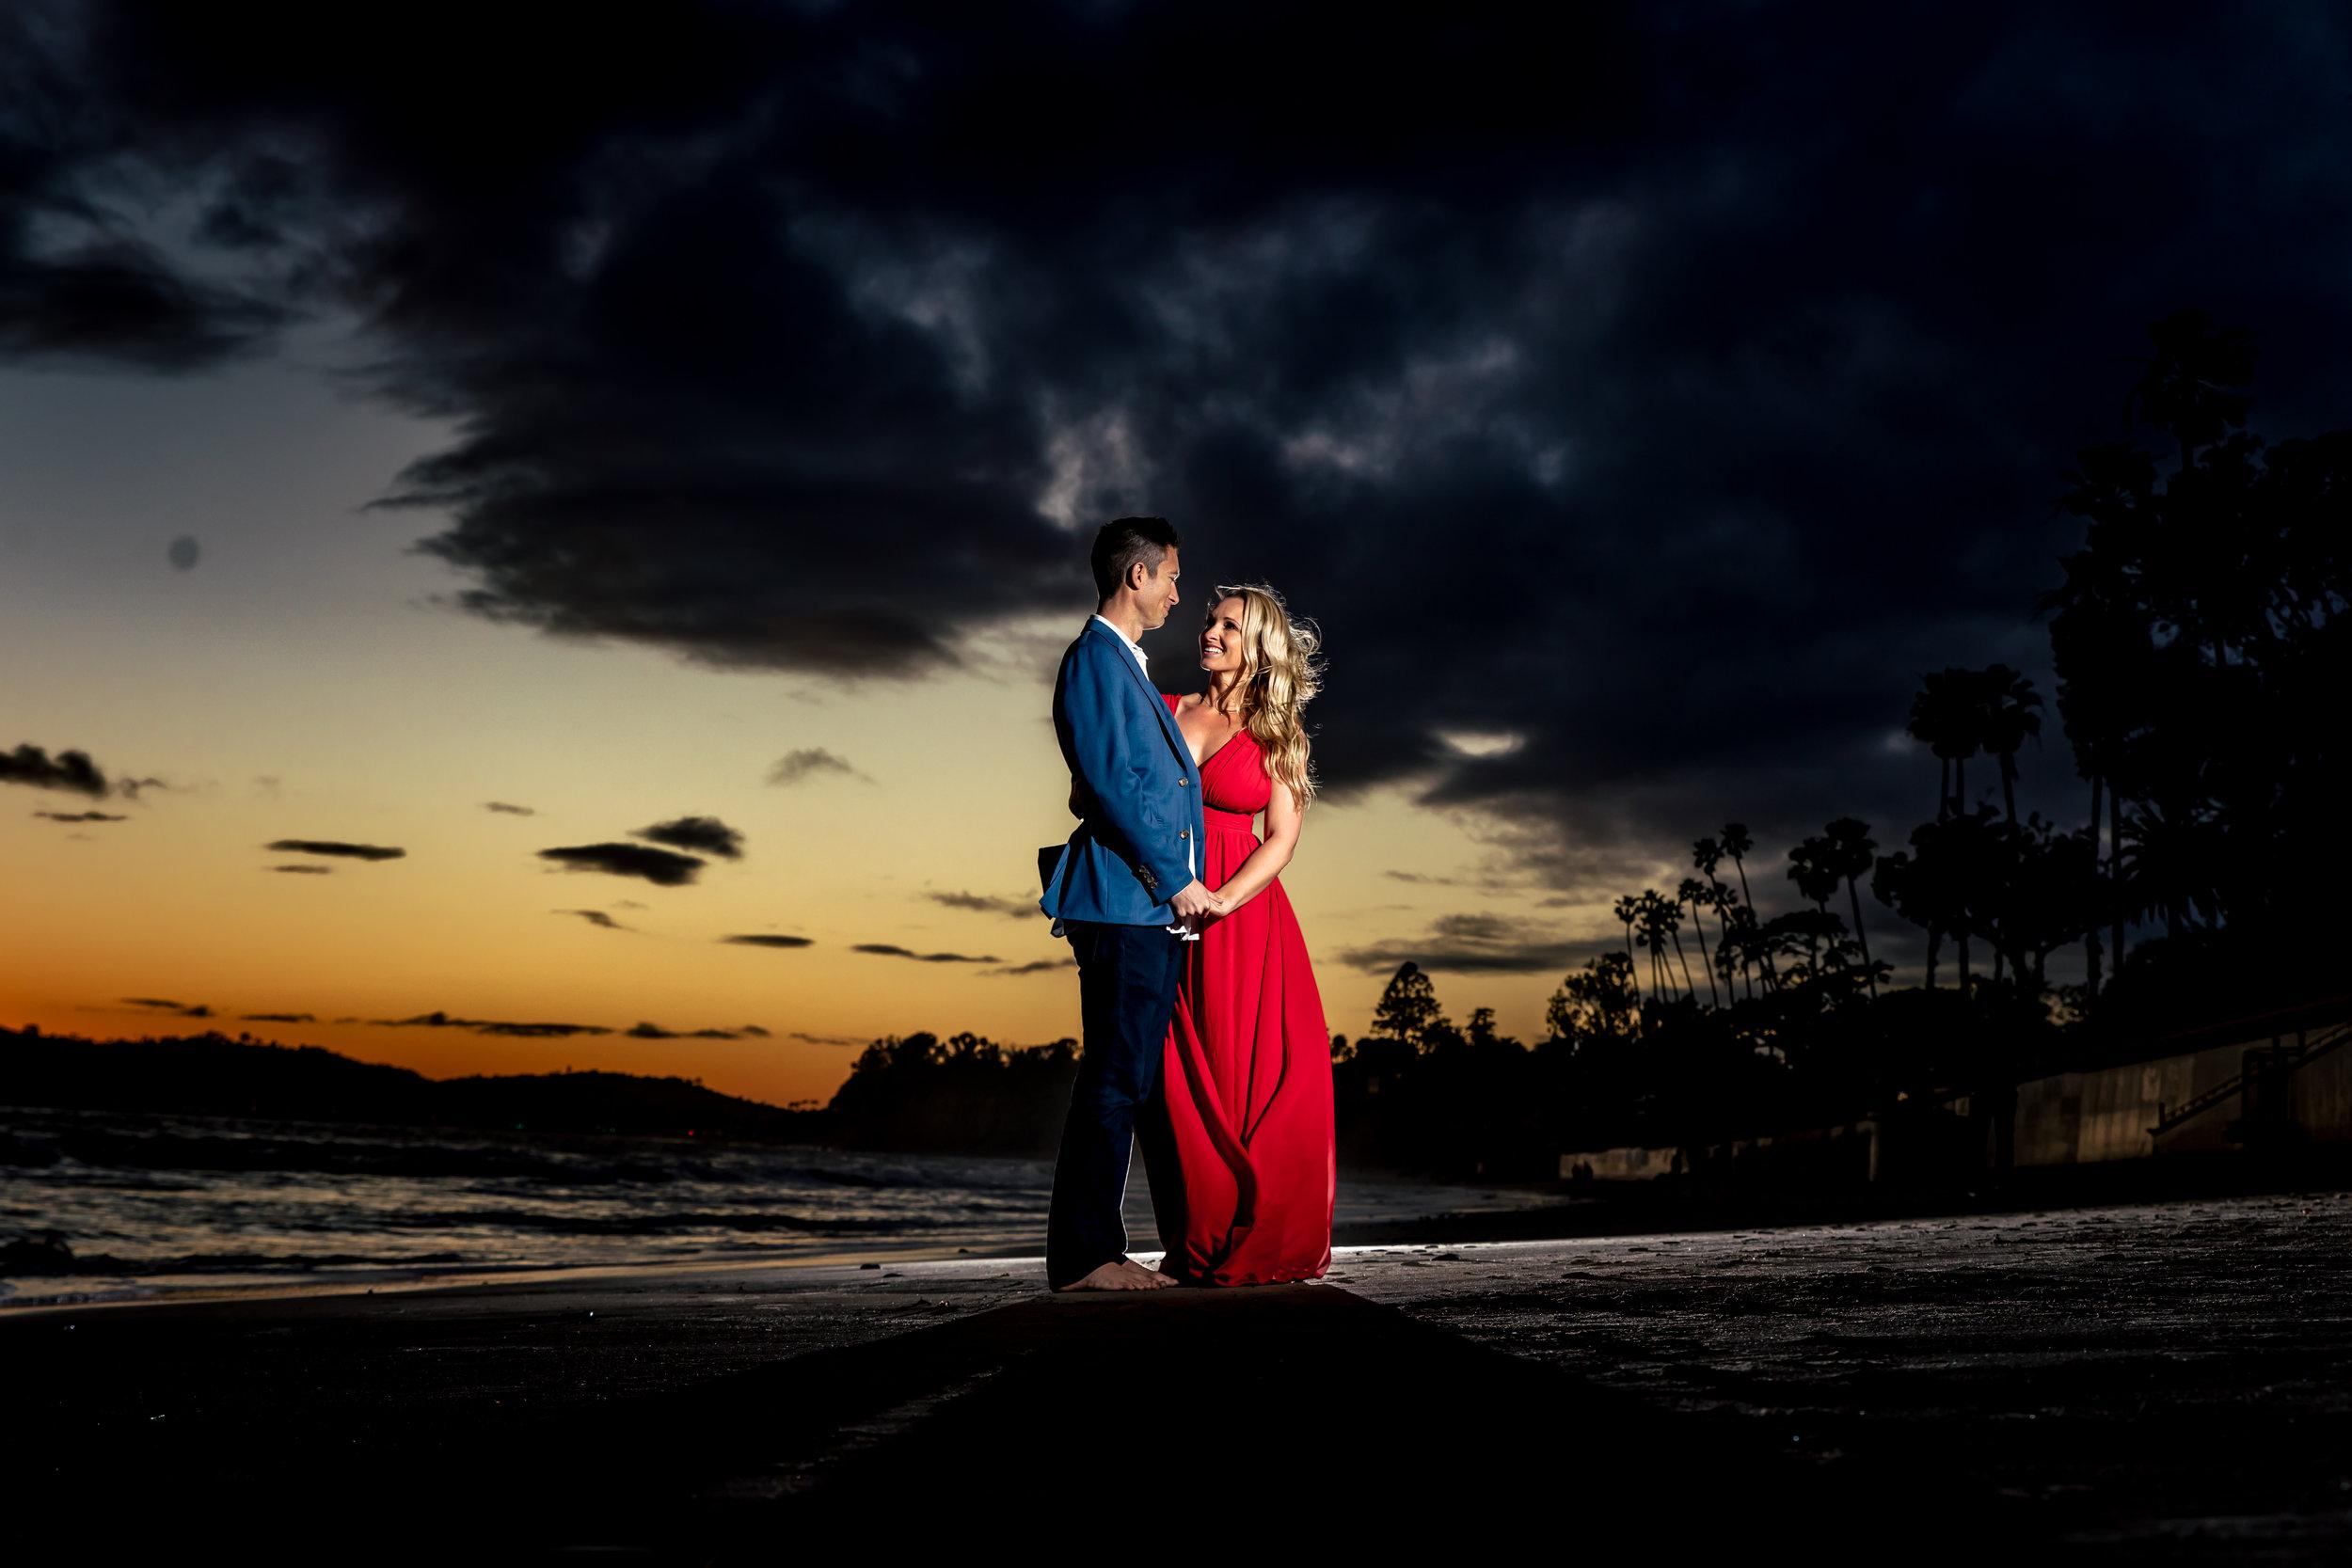 santabarbarawedding.com | Rewind Photography | Butterfly Beach | Engaged Couple on Beach at Dusk